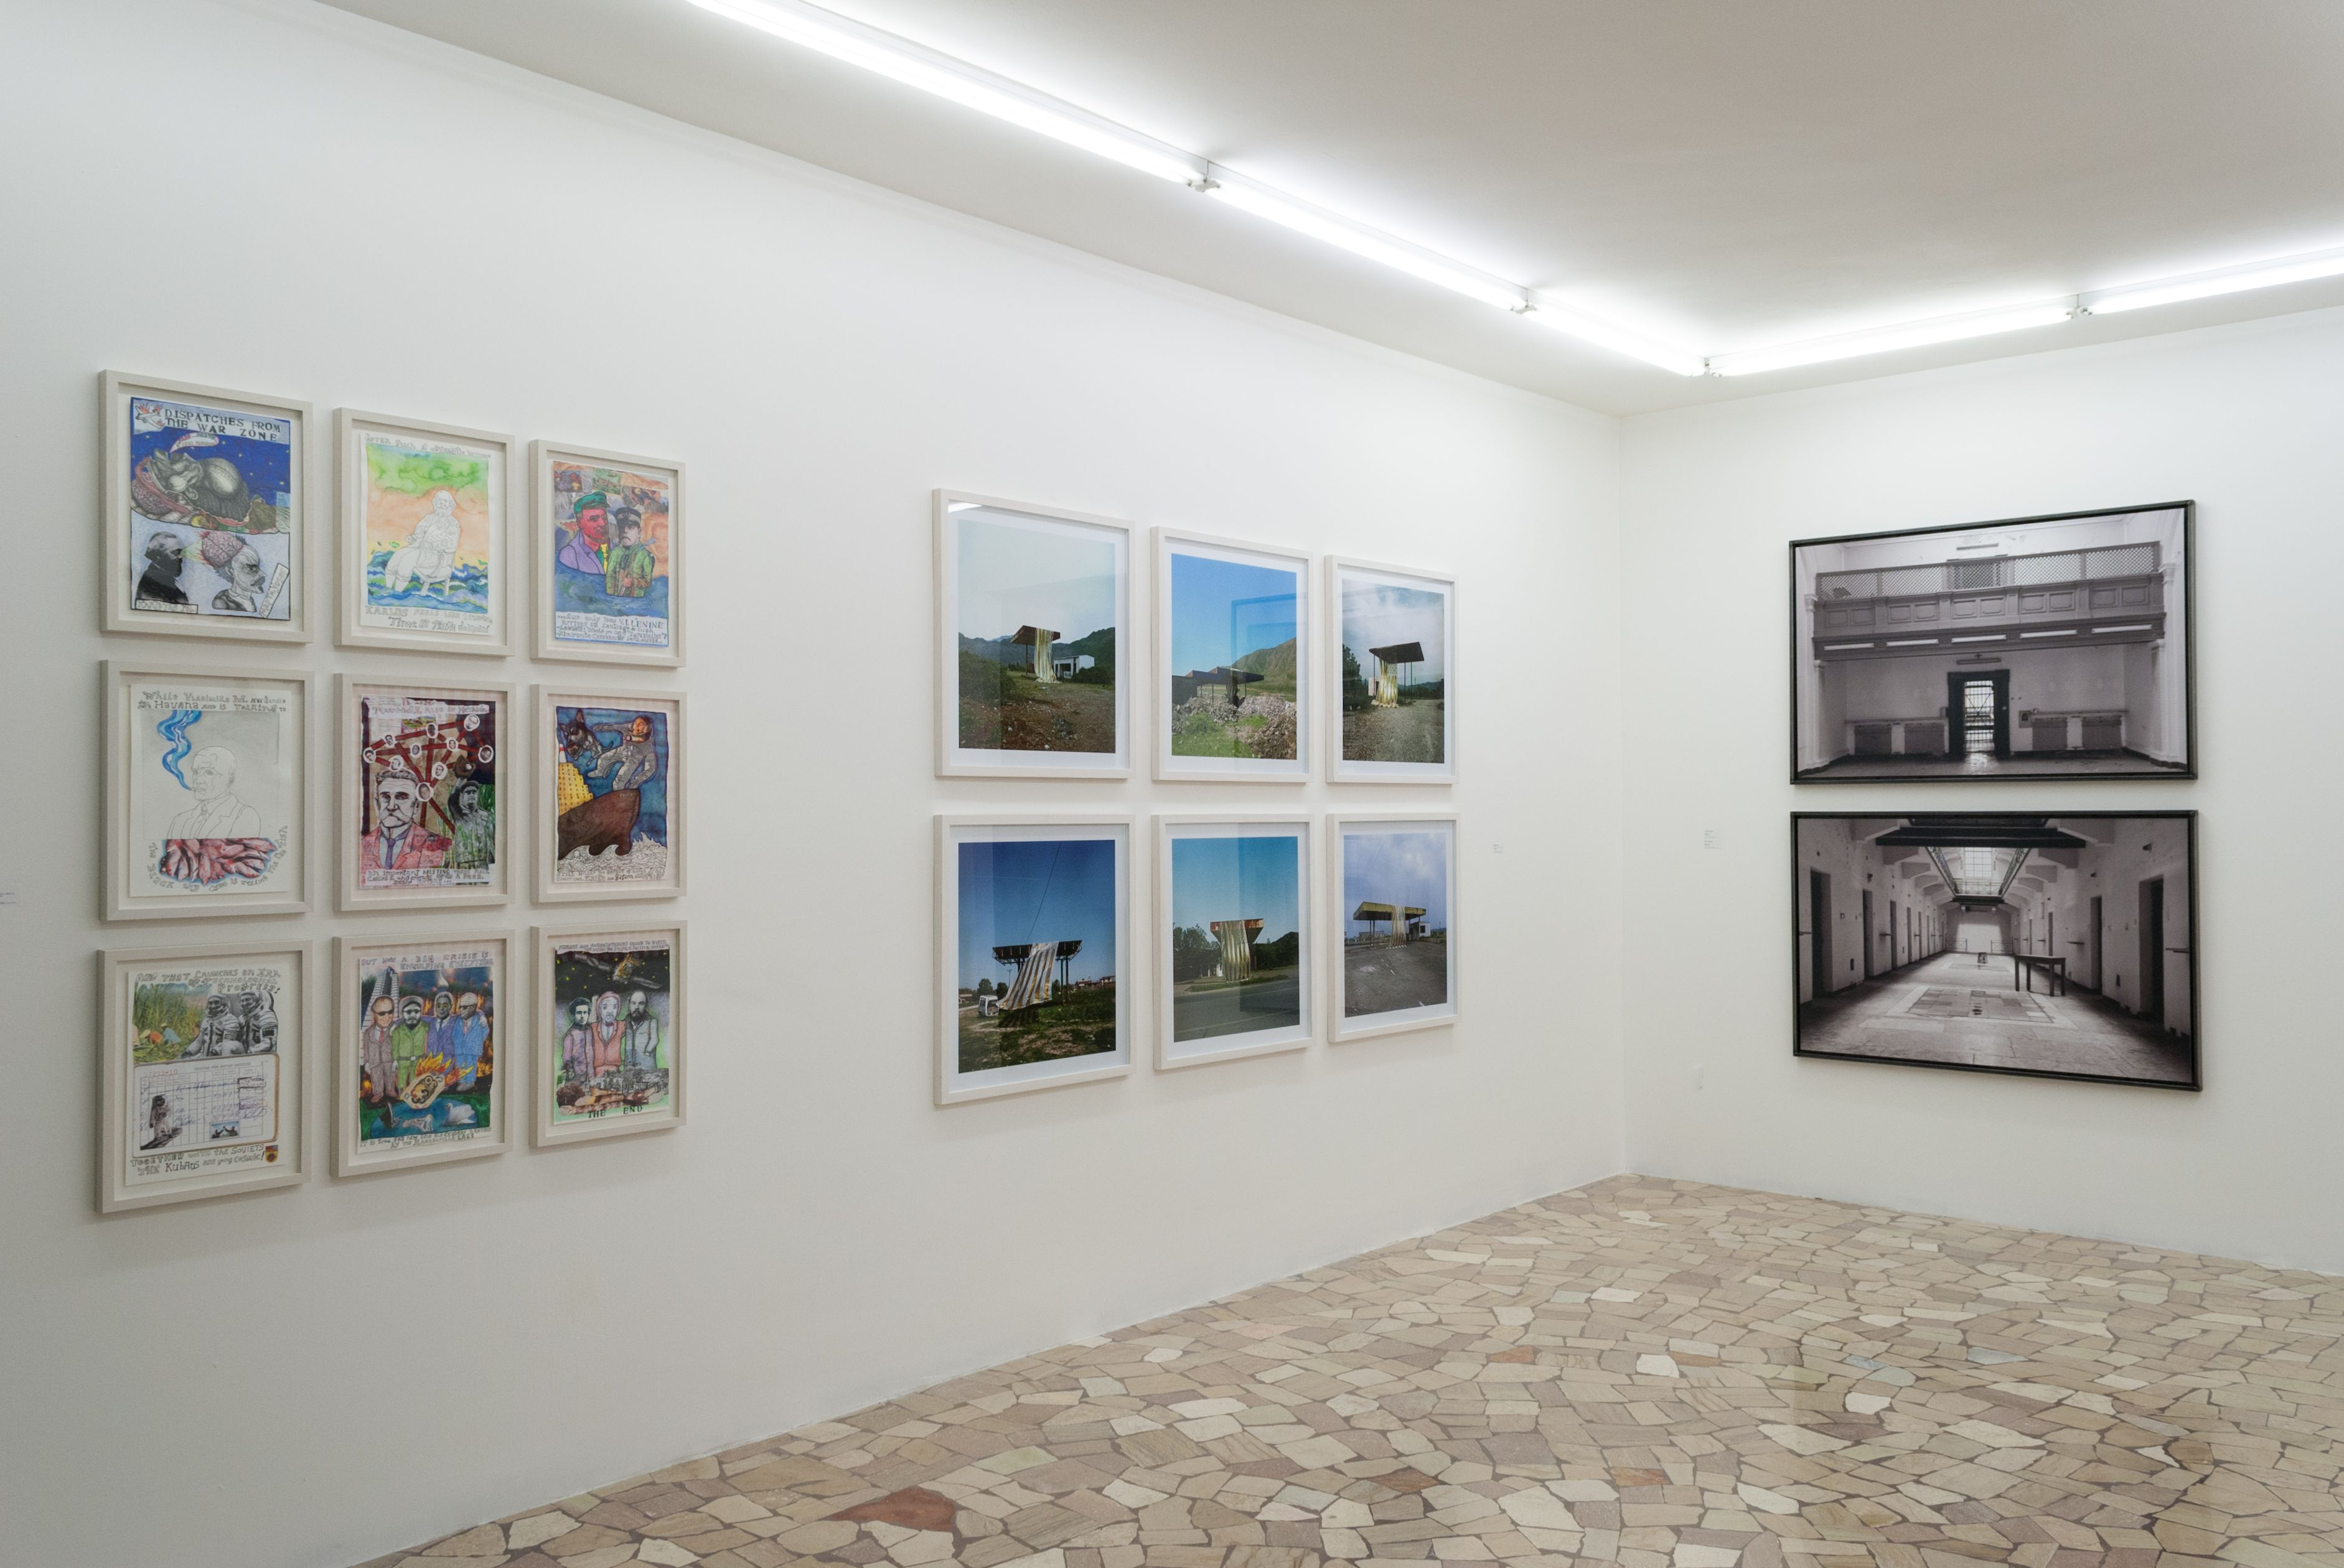 Tonel, Armando Lulaj and Nicola Eccher Ho(M)me group exhibition Paolo Maria Deanesi Gallery #DeanesiGallery